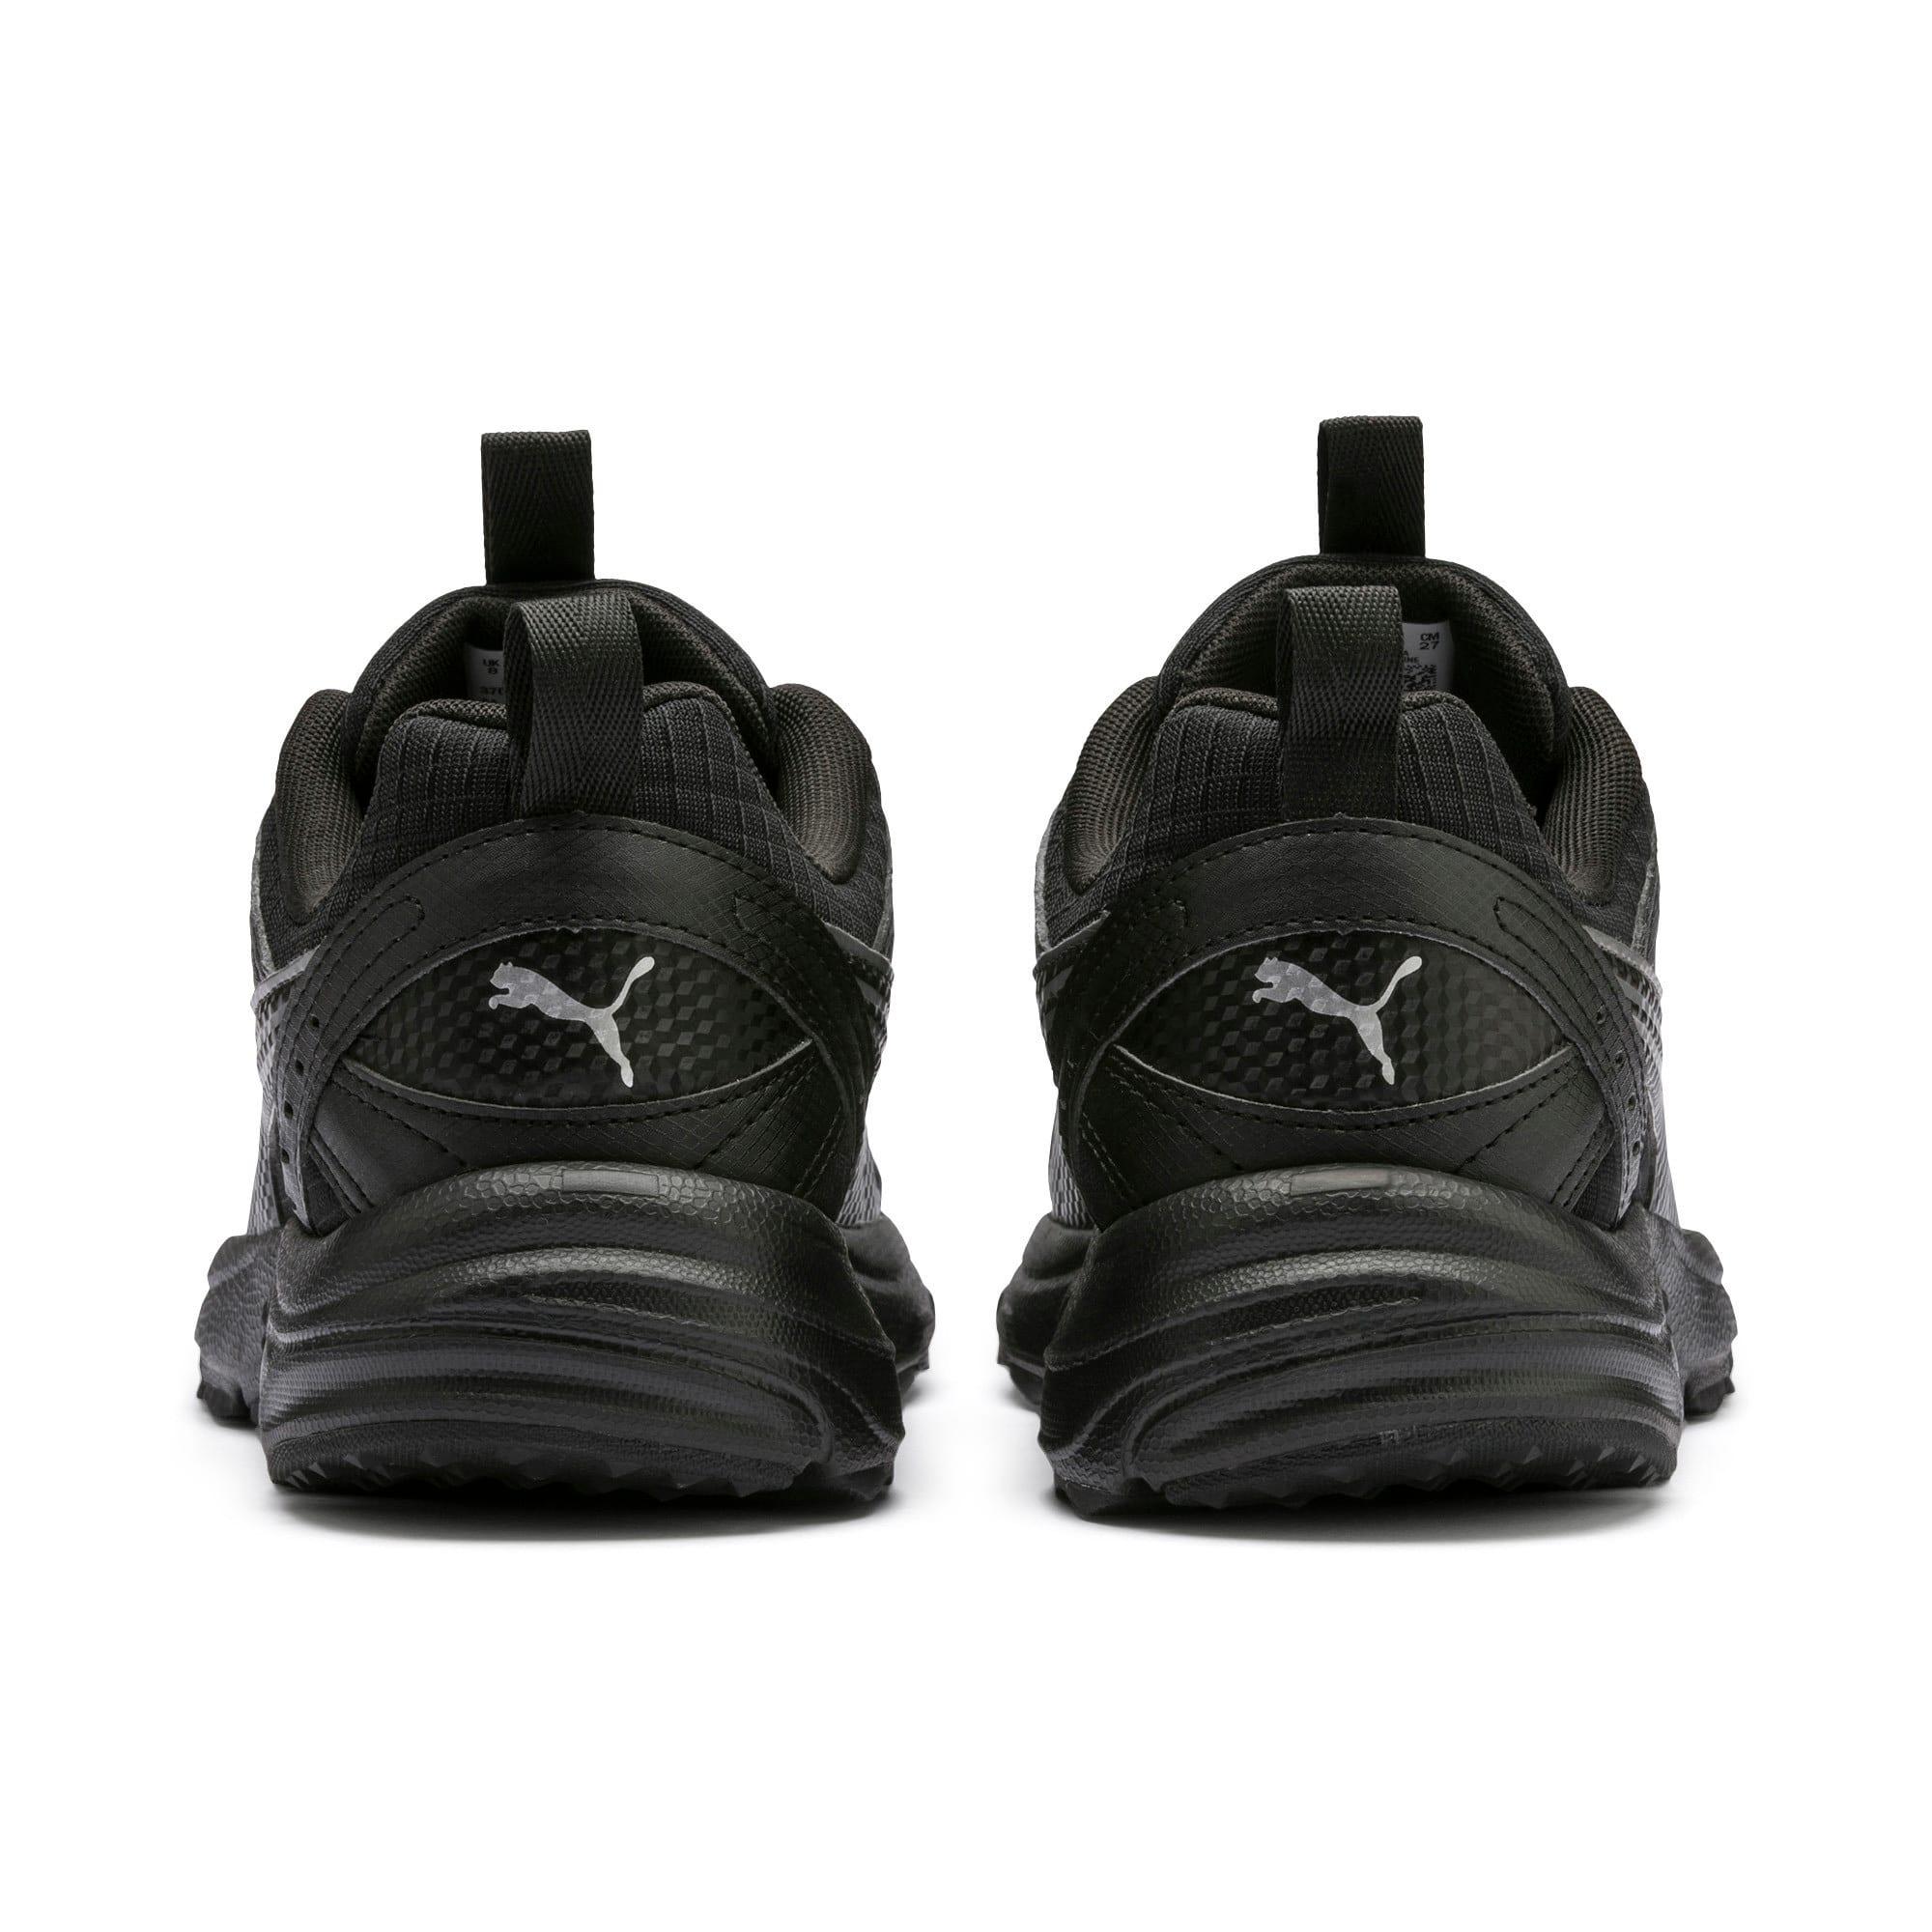 Thumbnail 4 of Axis Trail Sneakers, Puma Black-CASTLEROCK-Silver, medium